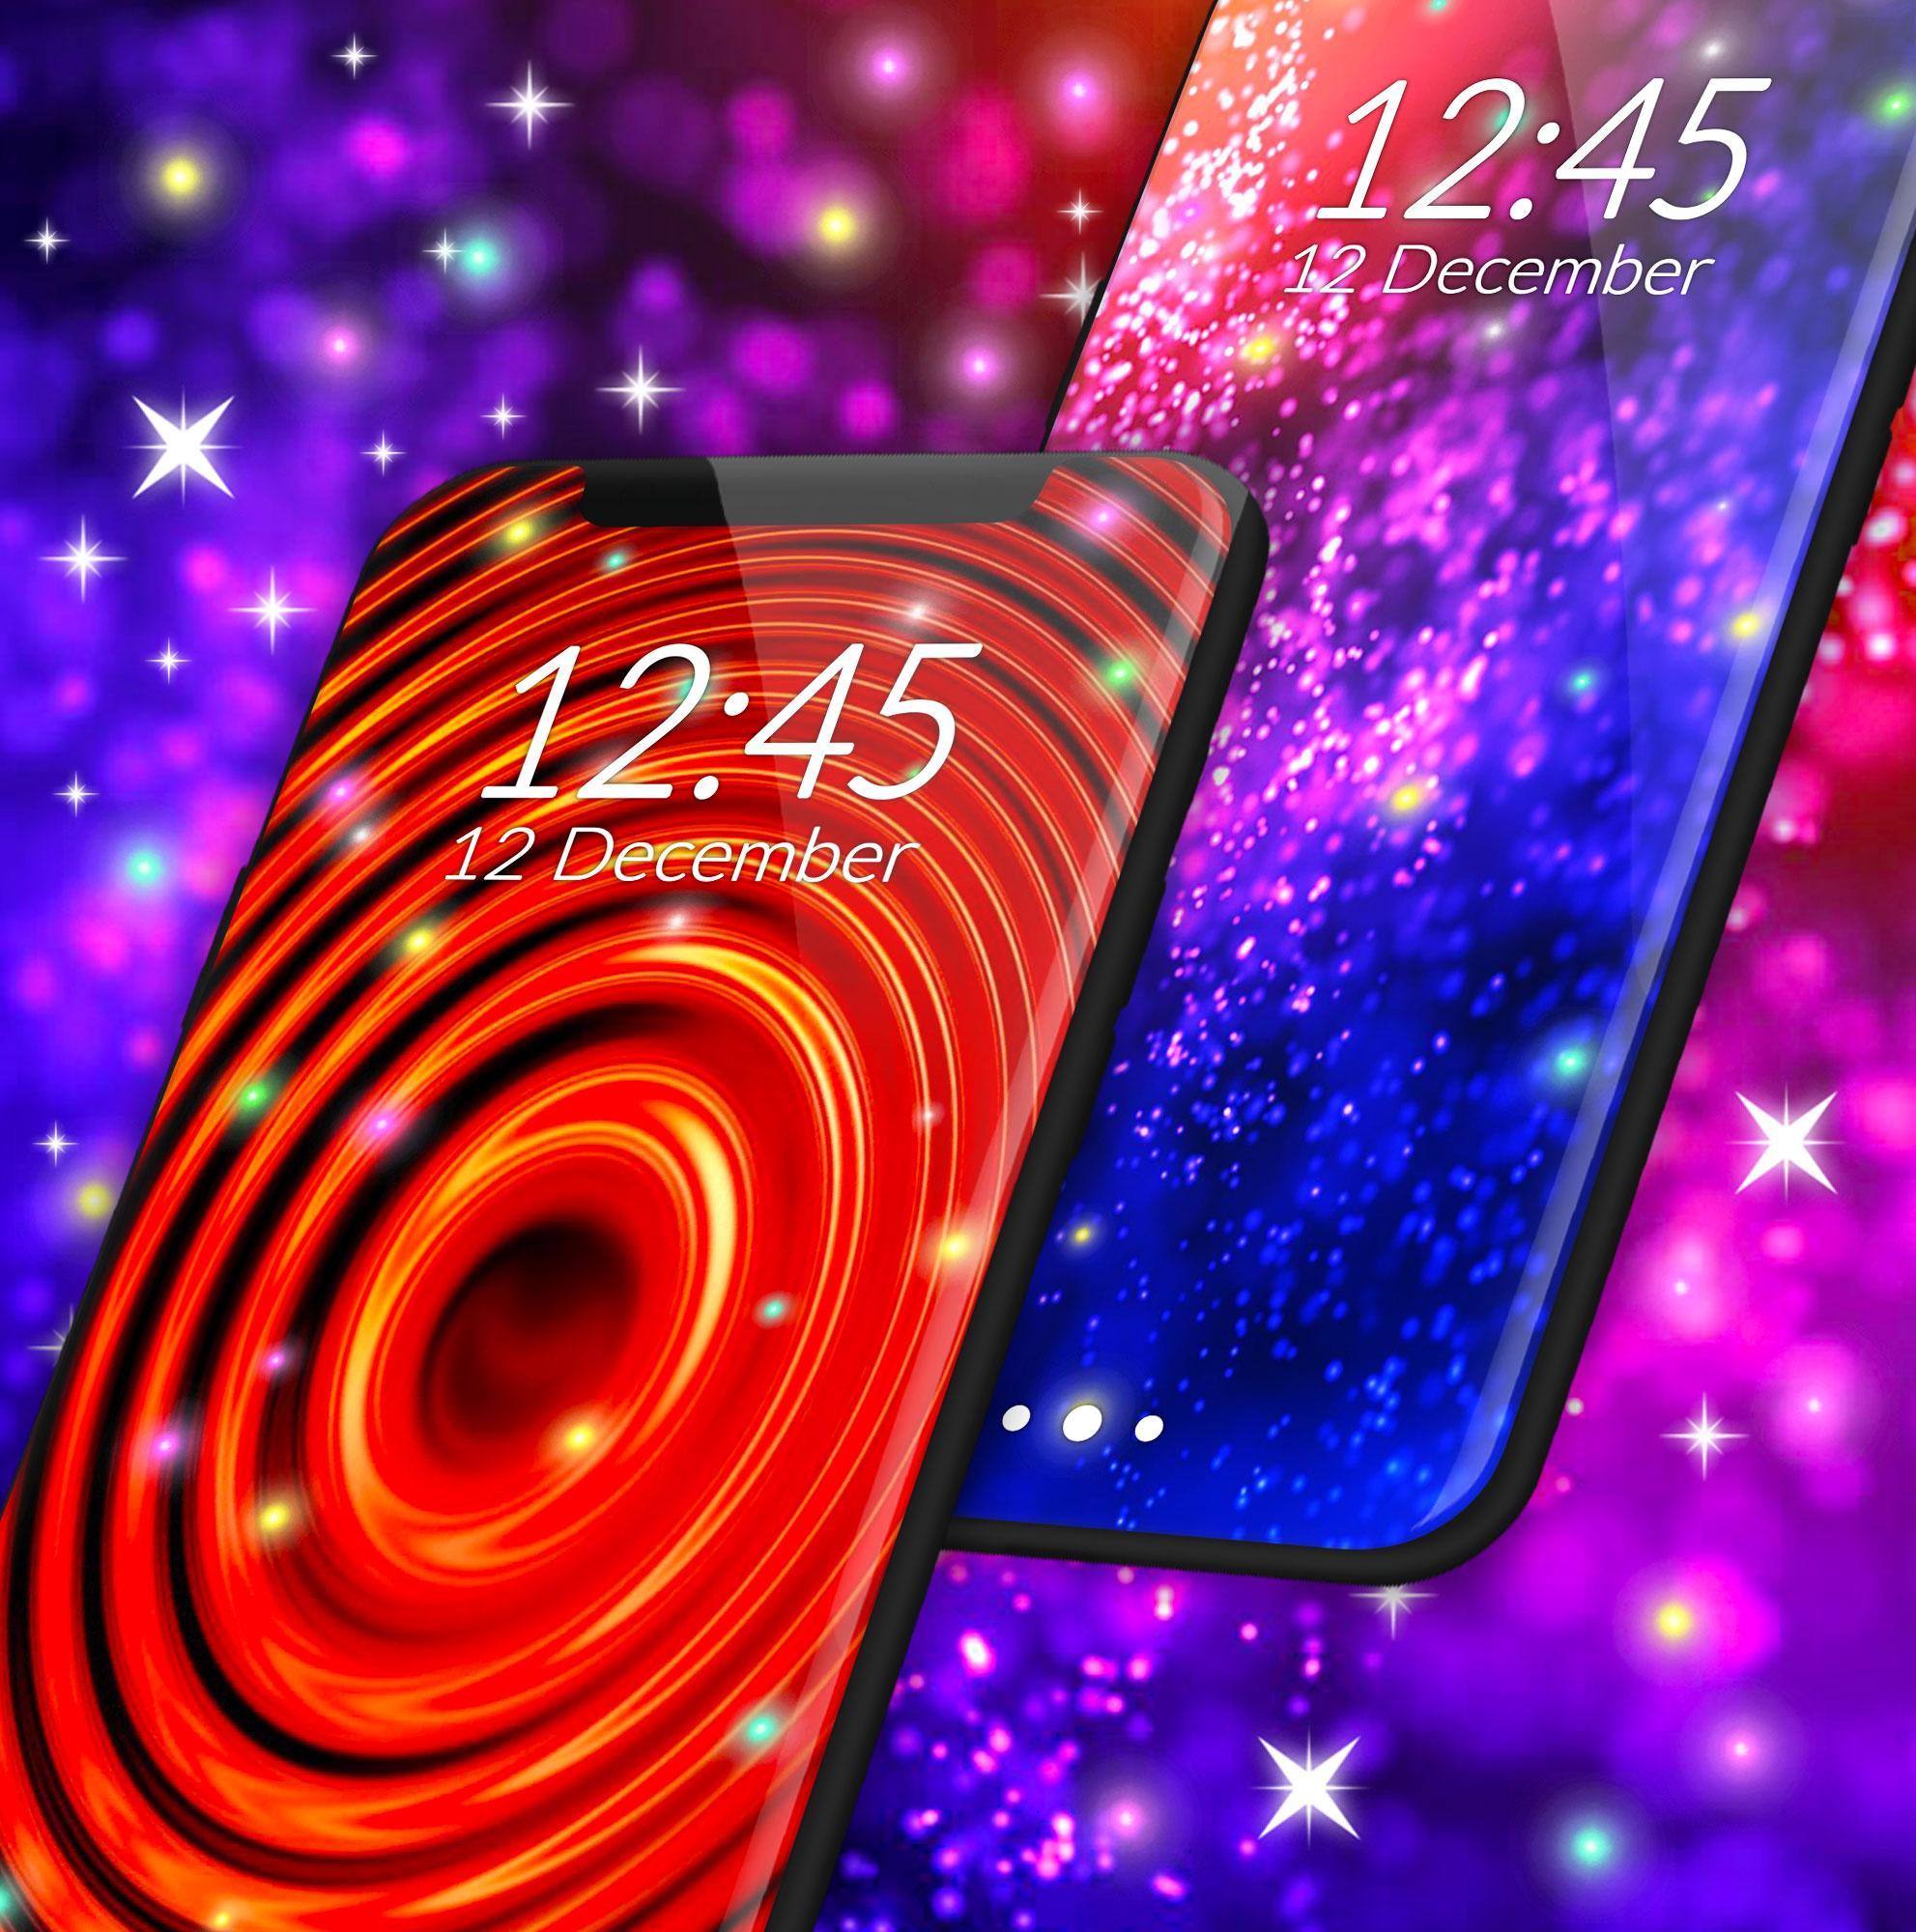 Live Wallpaper 3D Touch ⭐ Best Free HD Wallpapers APK 6.4 ...